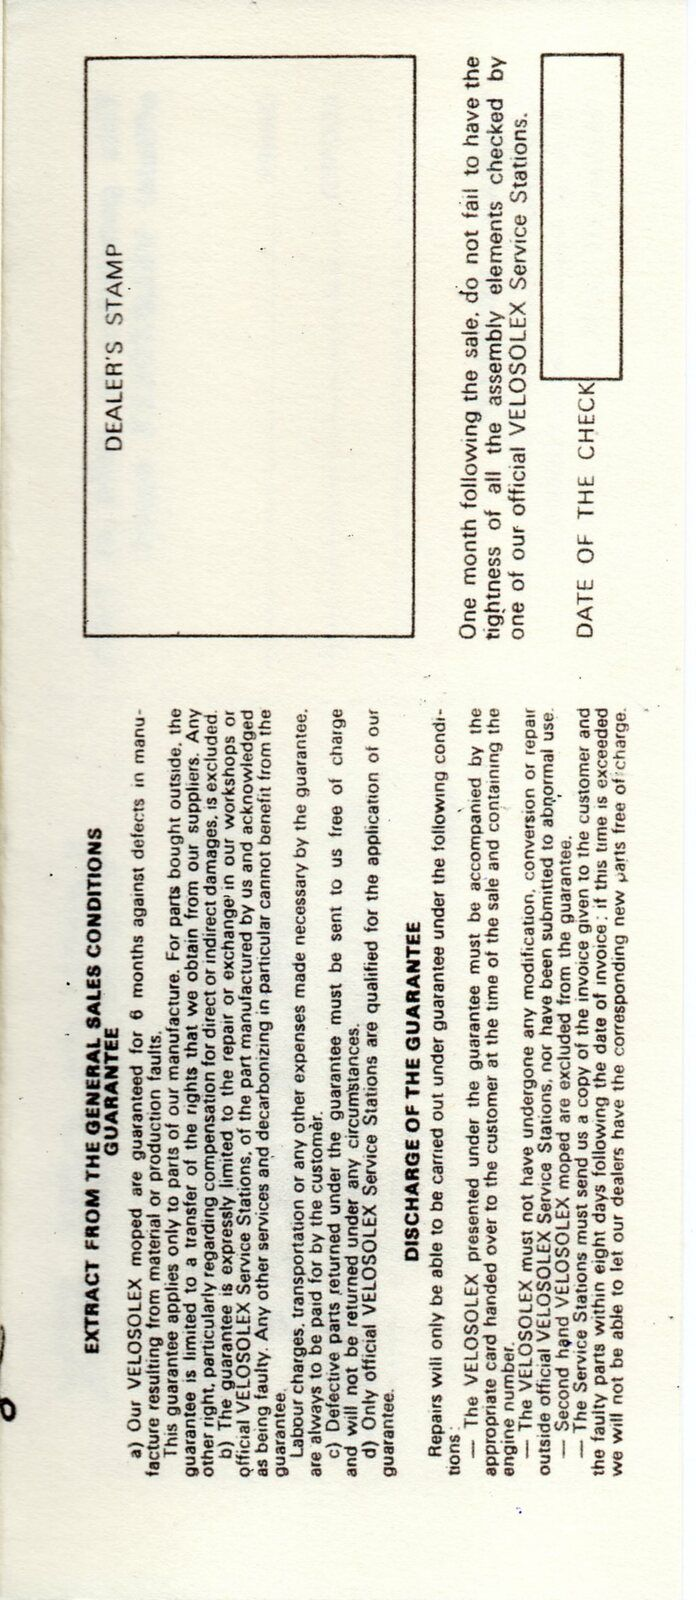 07. 4600 V1 Owner's Handbook